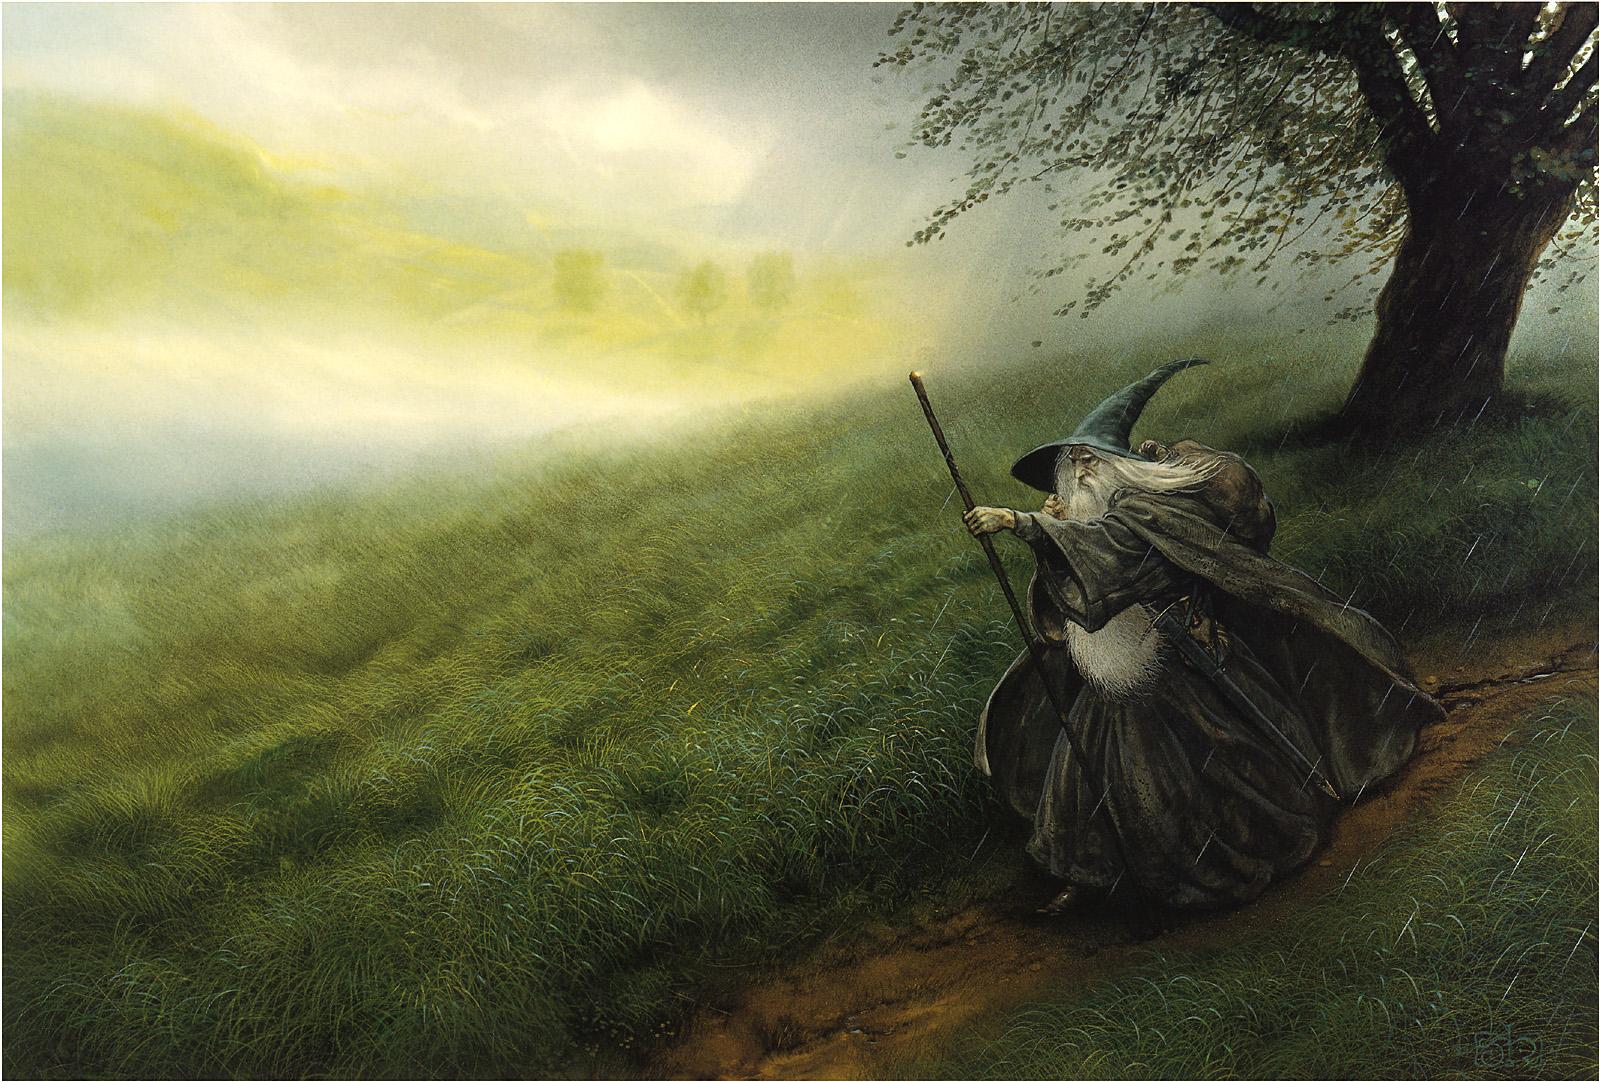 King Arthur Magical Day Tour